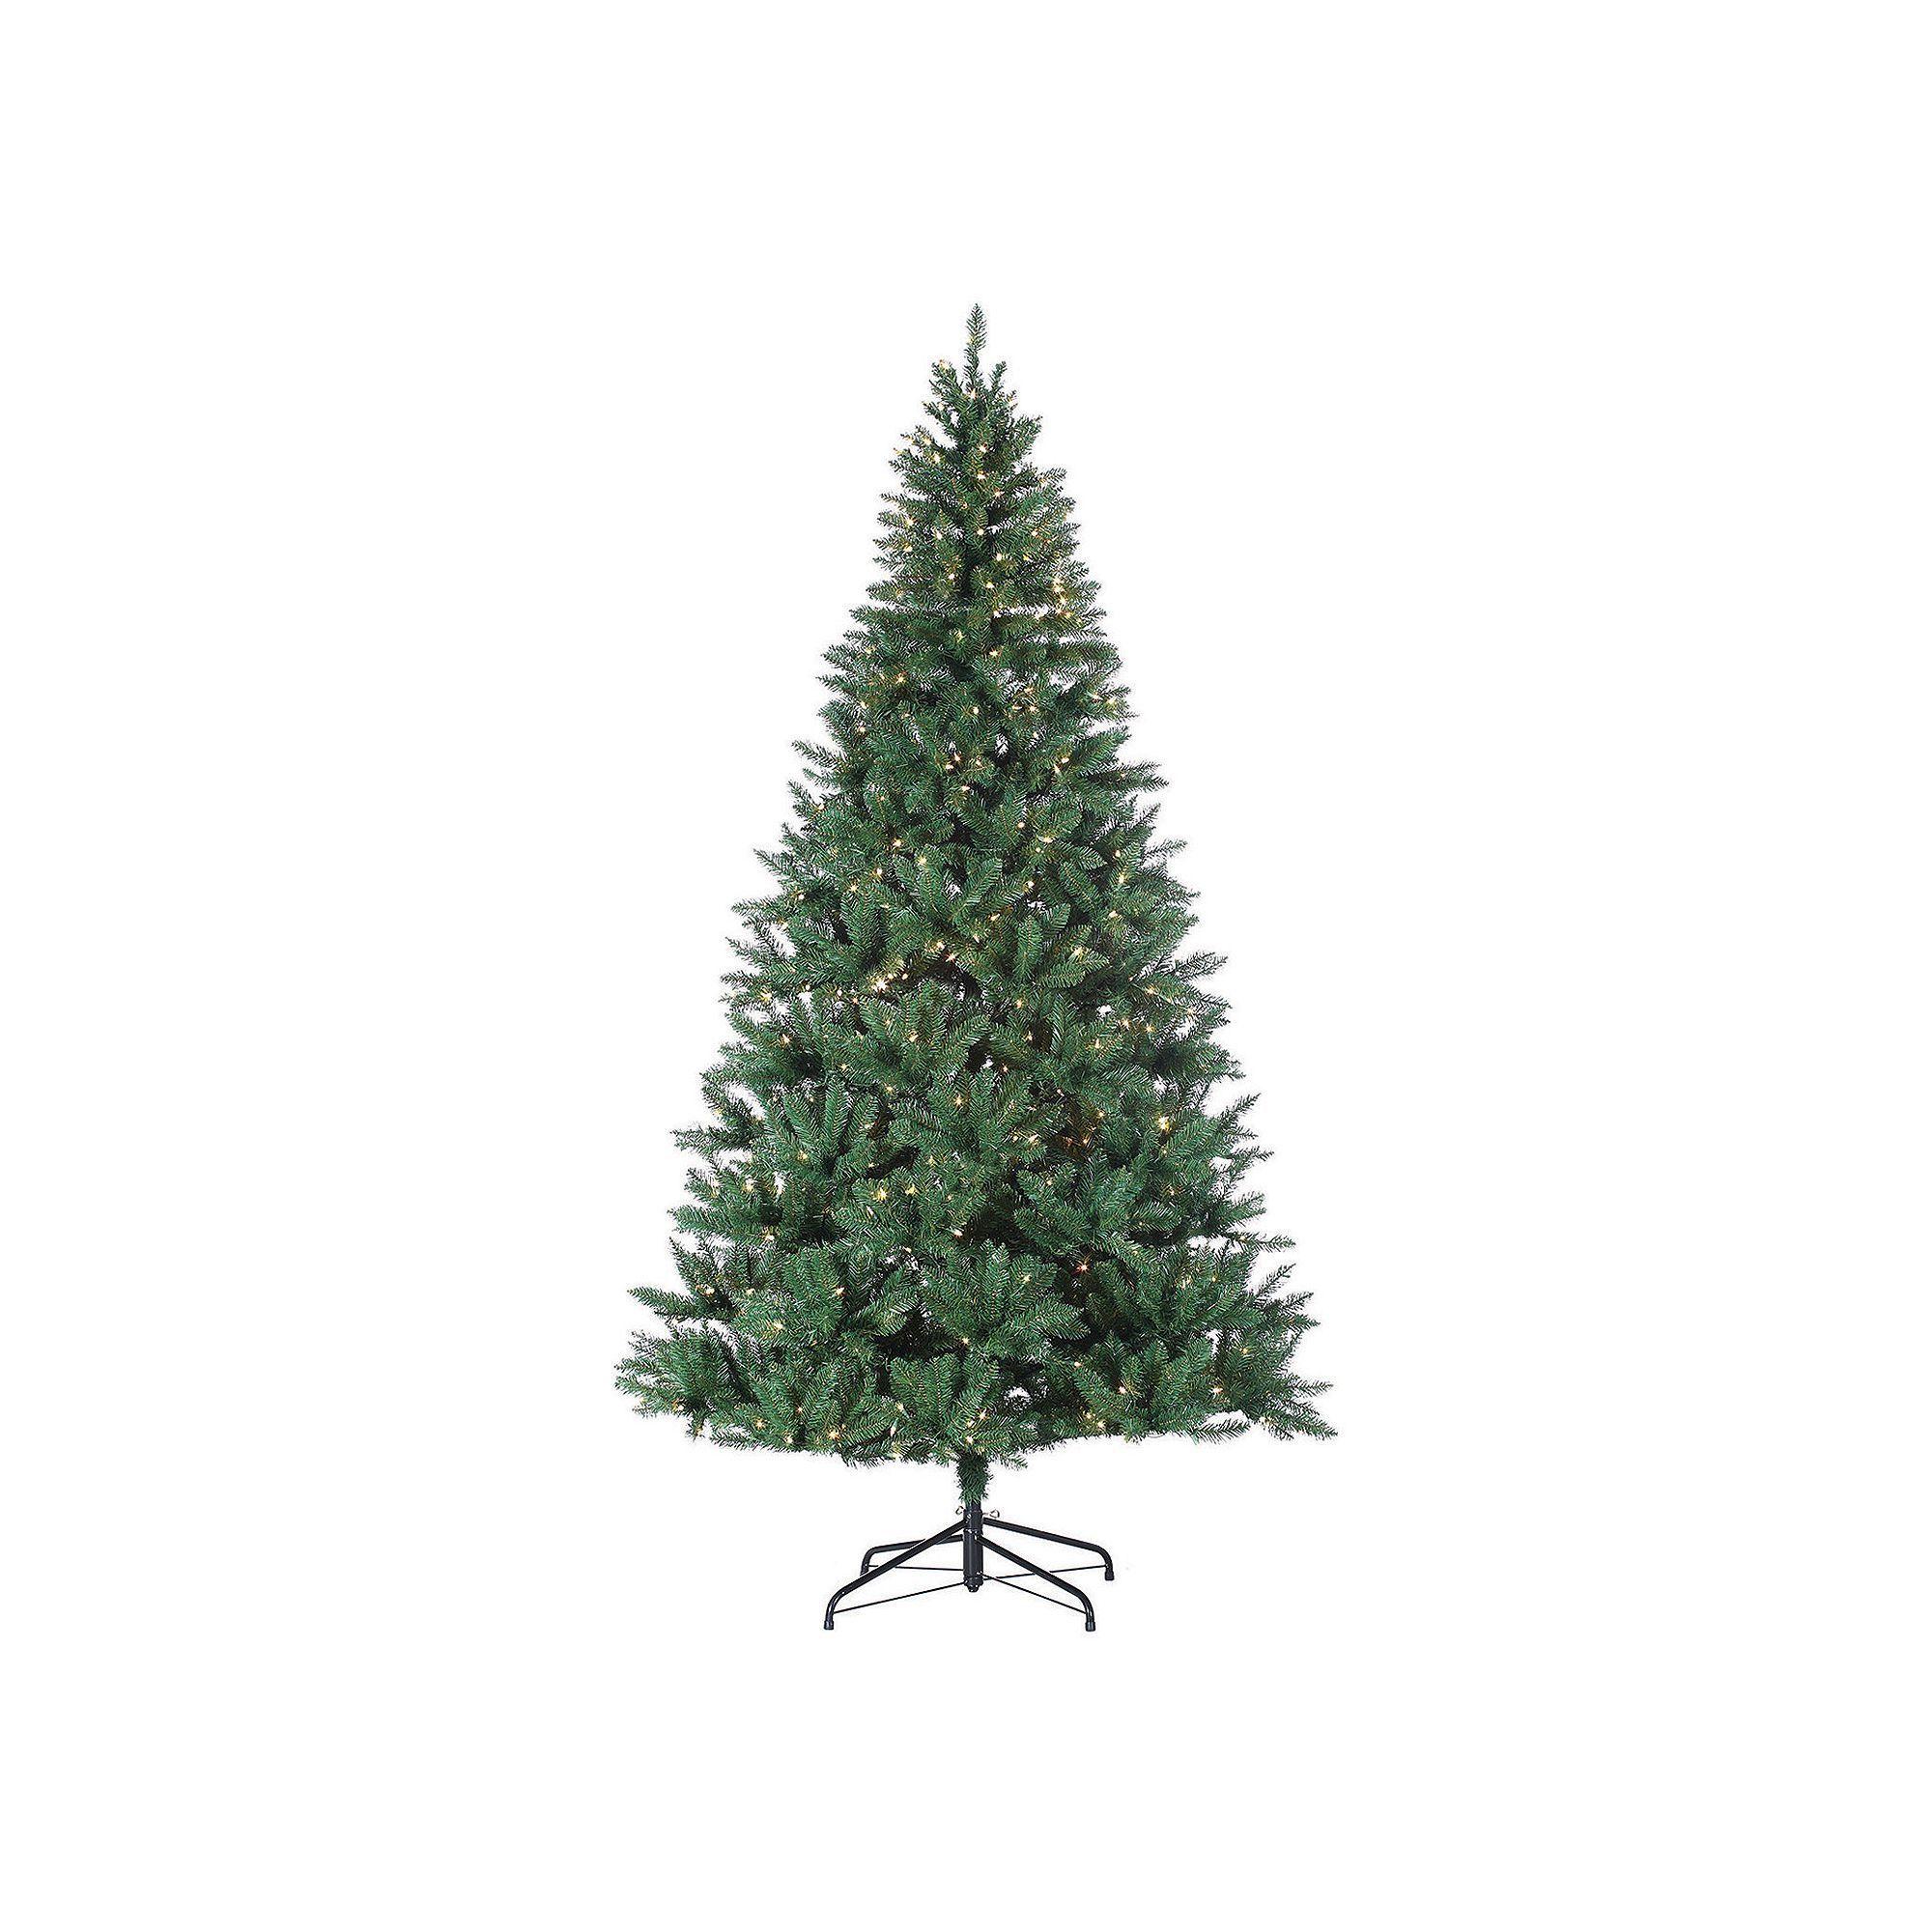 8ft Christmas Tree Pre Lit: Sterling 8-ft. Pre-Lit Hudson Pine Artificial Christmas